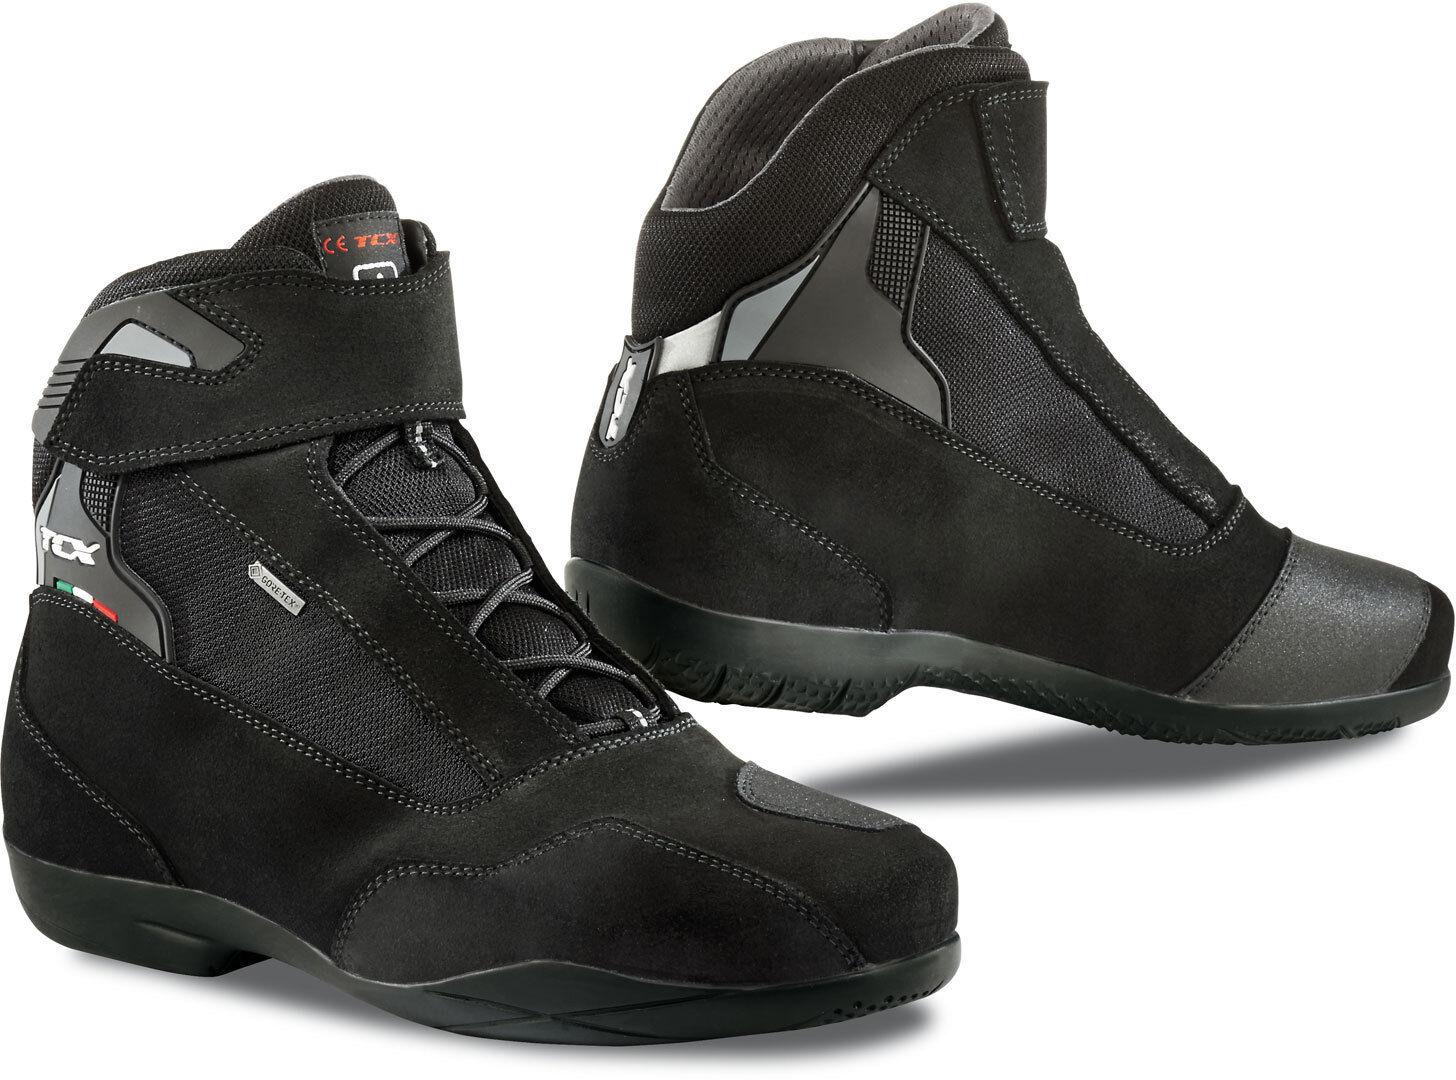 TCX Jupiter 4 Gore-Tex Chaussures de moto Noir taille : 38